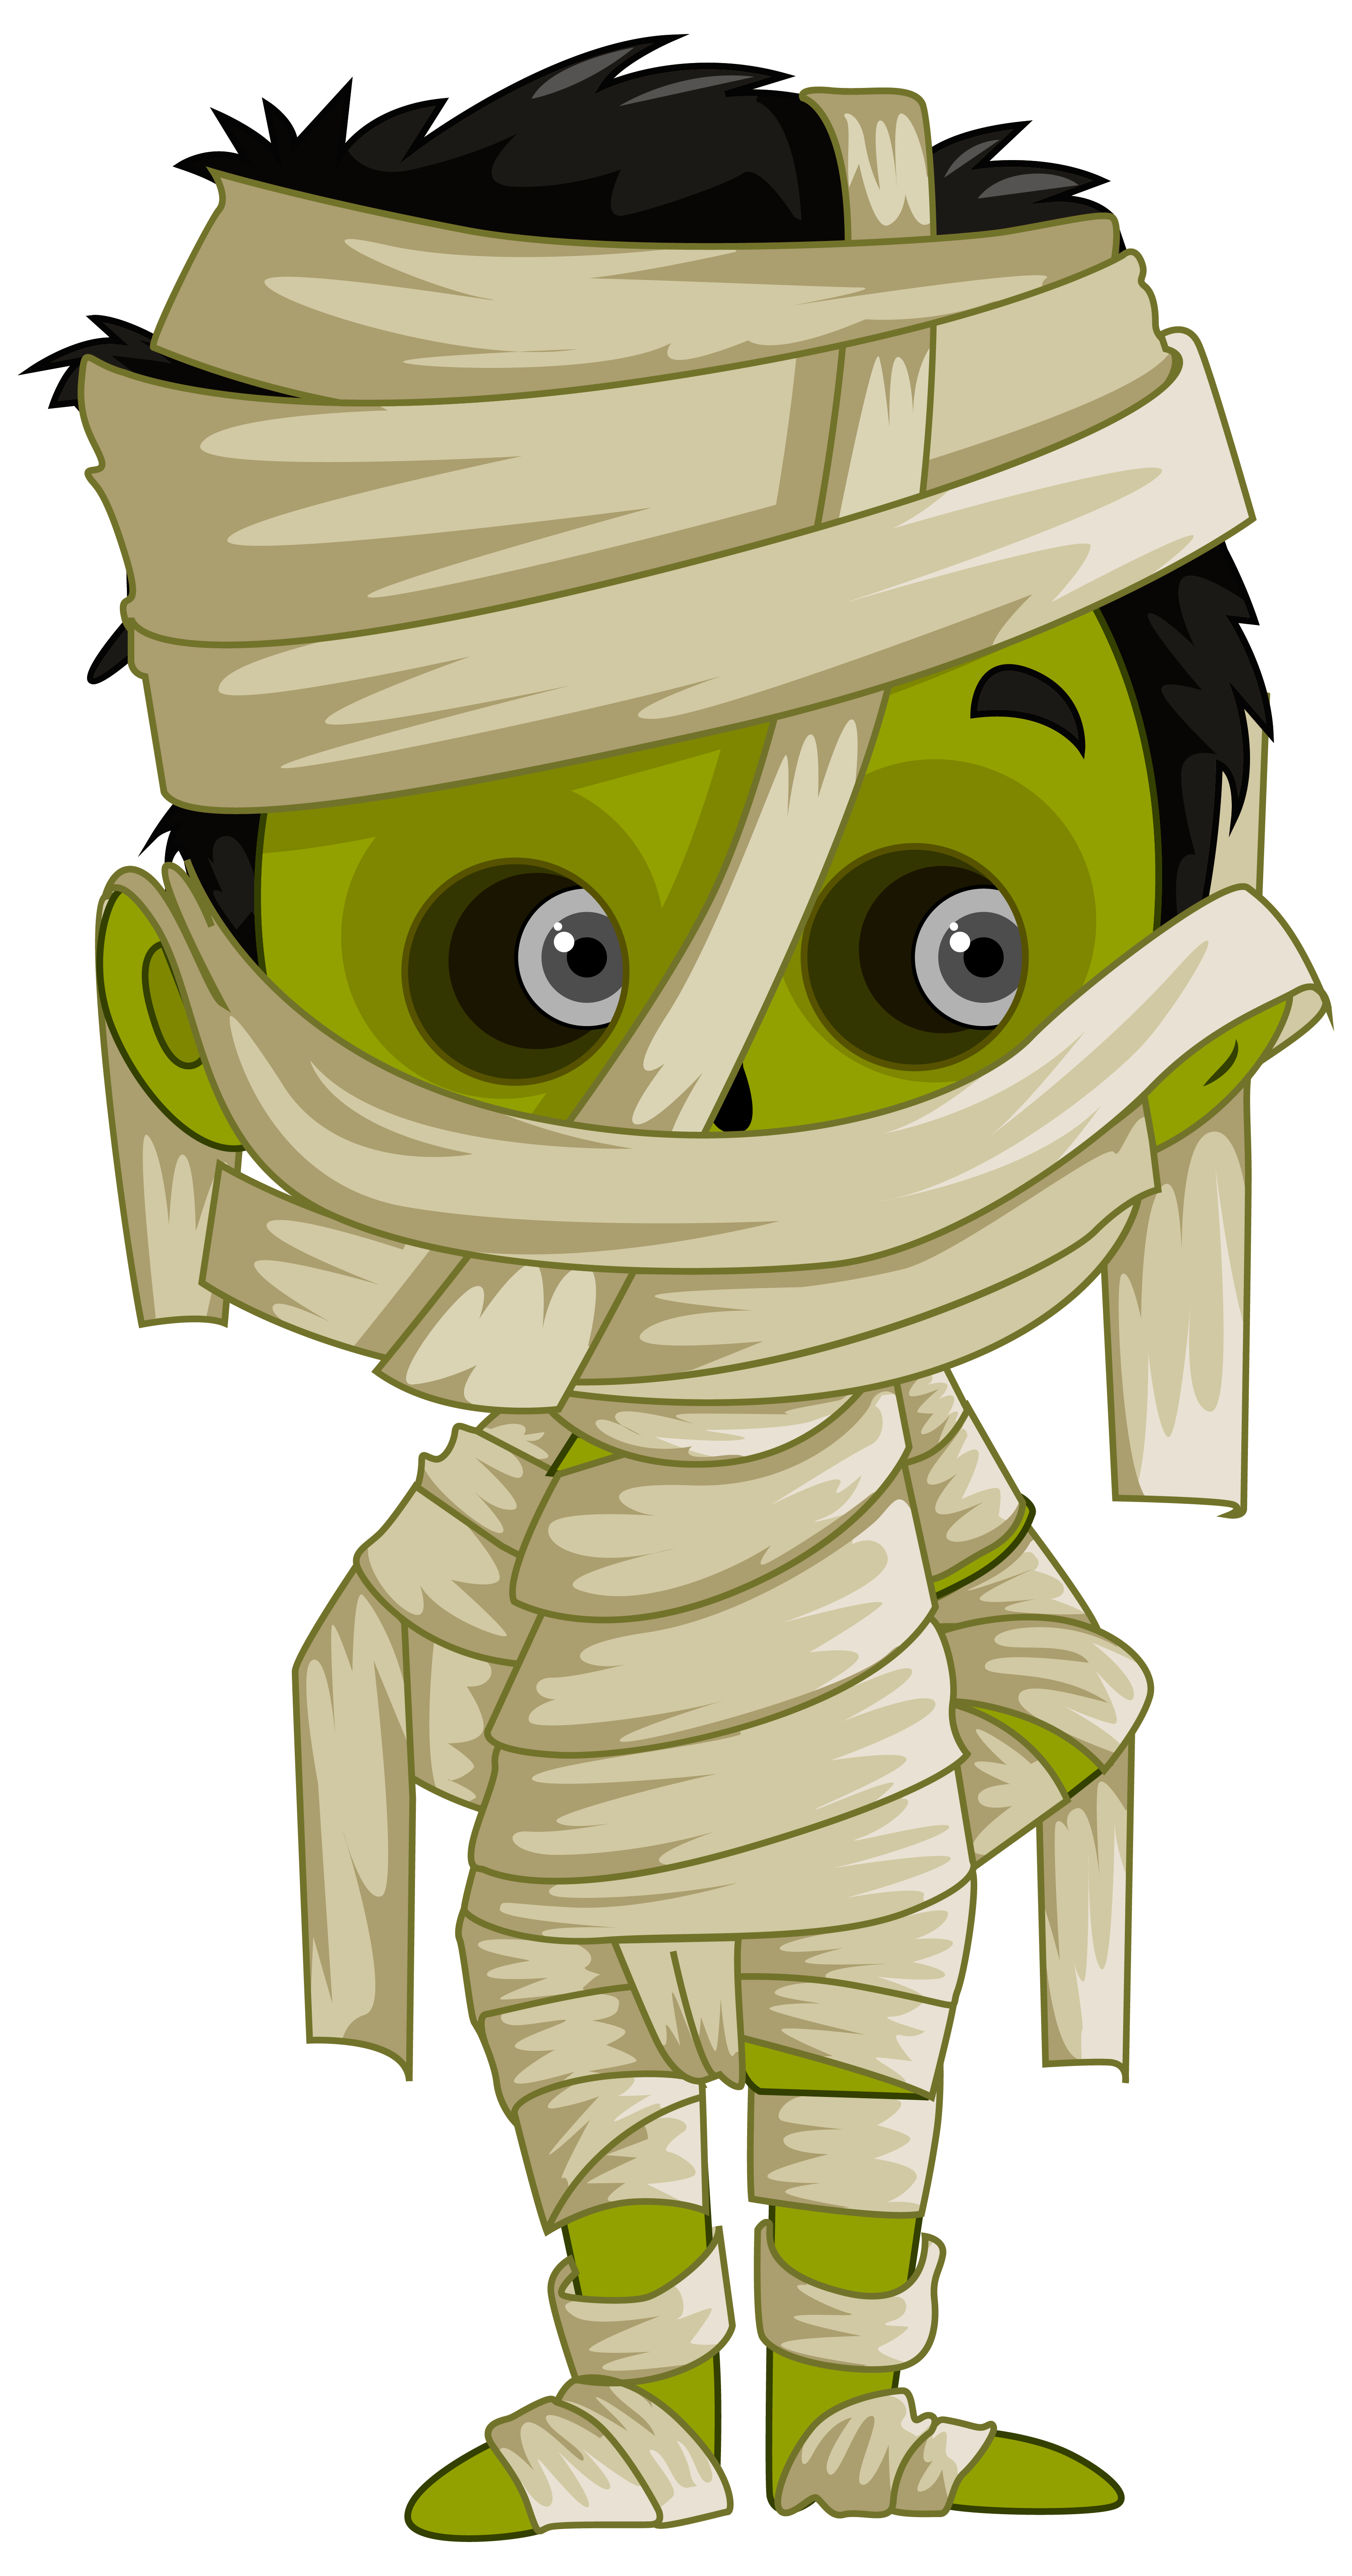 Halloween clipart mummy royalty free 28+ Collection of Mummy Clipart Png | High quality, free cliparts ... royalty free